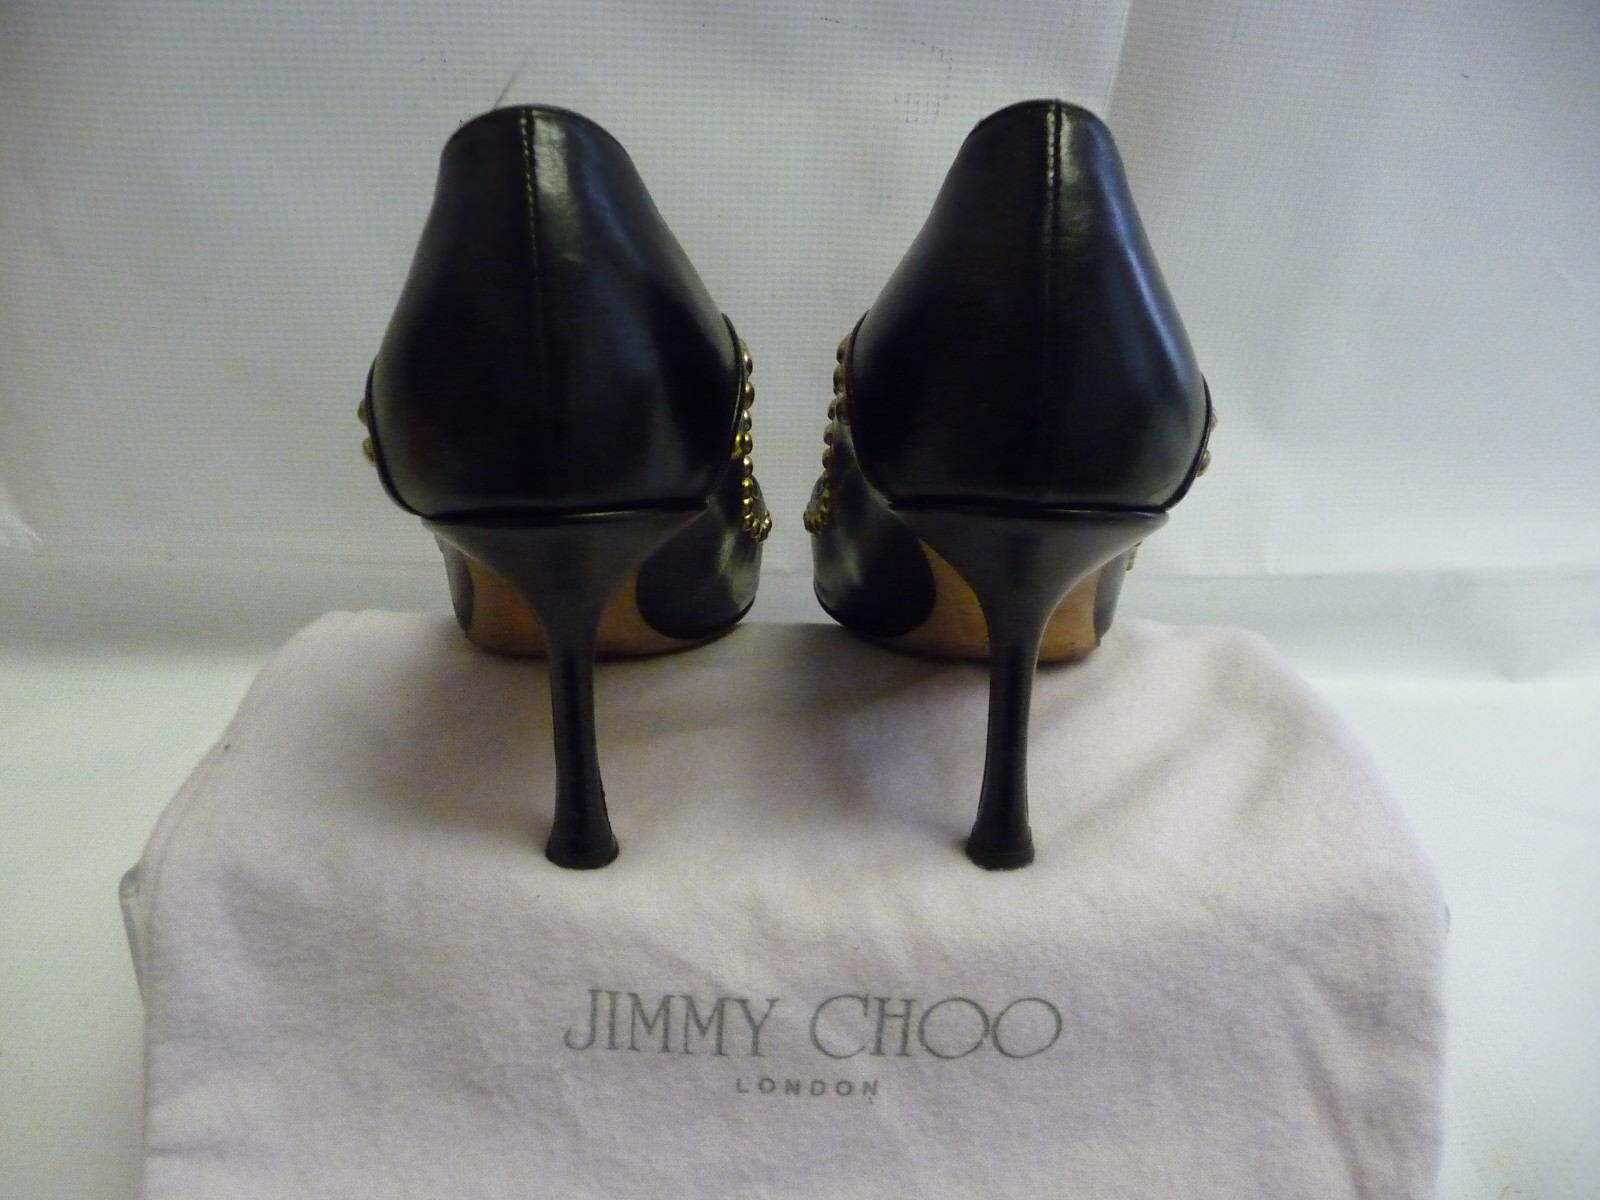 Jimmy Choo Boutique bombas bombas Boutique tamaño 39.5/9.5 Puntera De Punto De Cuero Negro Stiletto Italia 52caaa